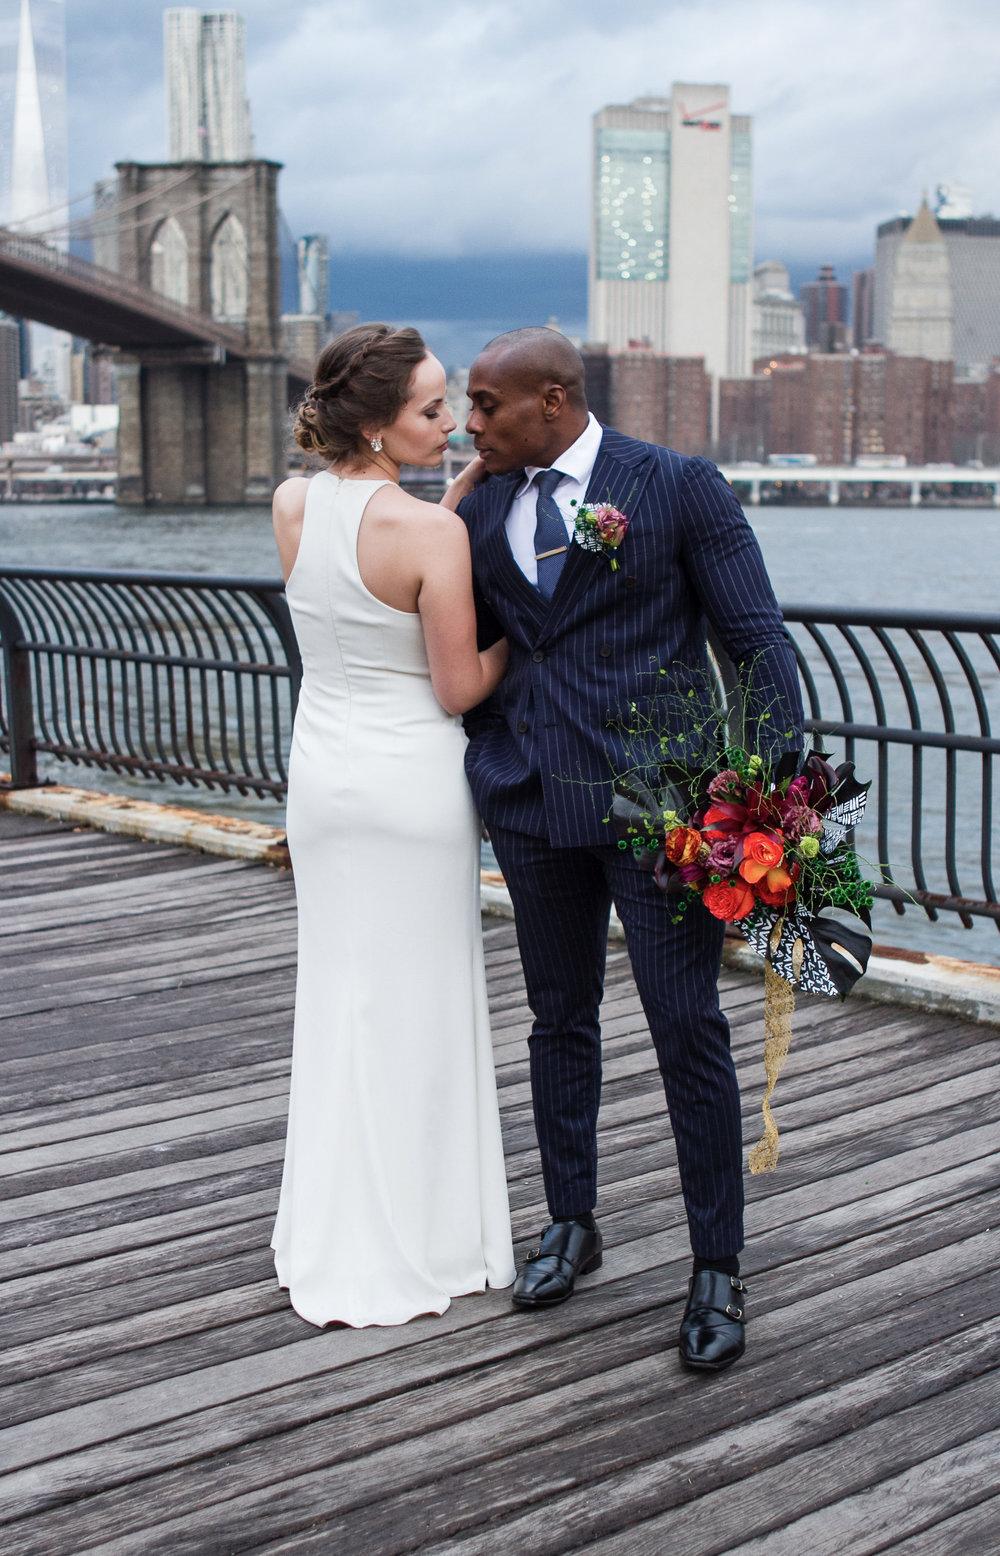 weddingshoot-104.jpg